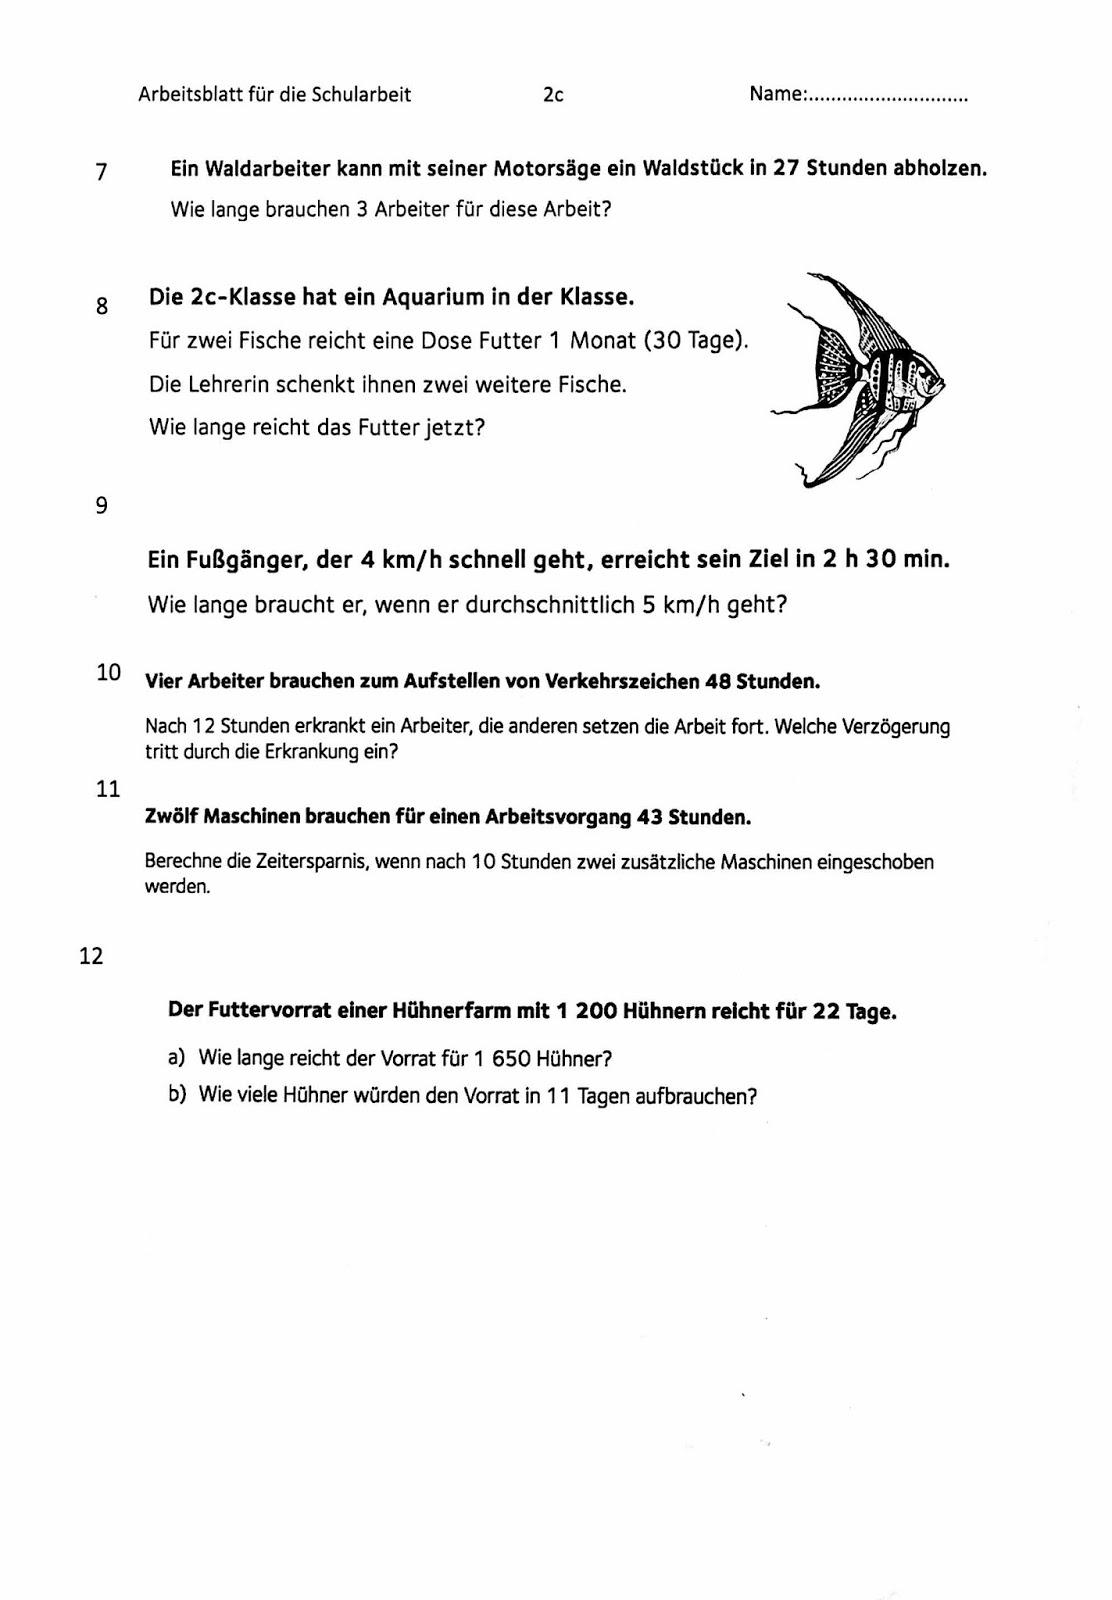 Großzügig Jahr 2 Numeracy Arbeitsblatt Galerie - Arbeitsblatt Schule ...